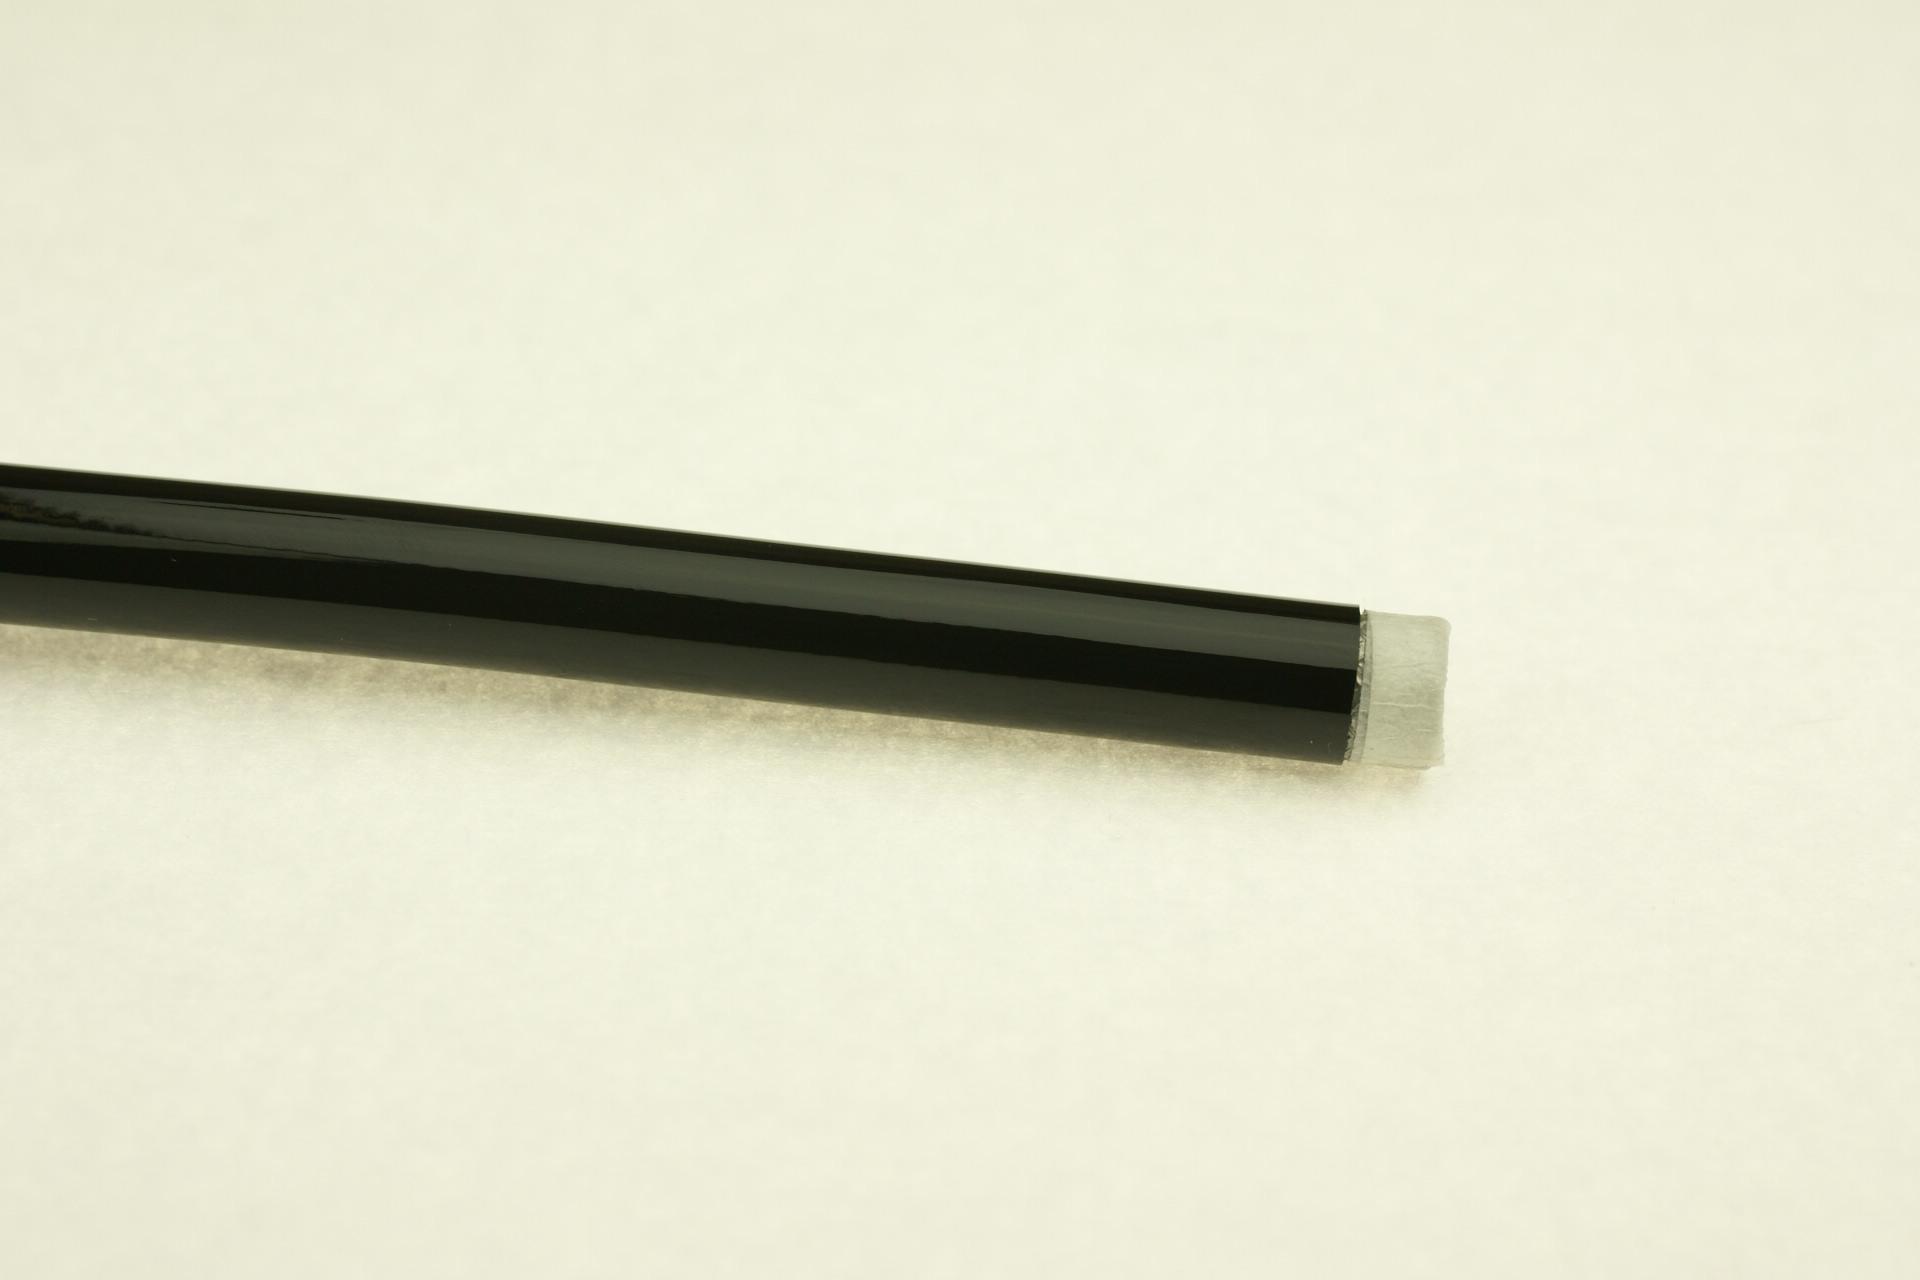 Light Guide Tube (Universal Cord) For Pentax® Bronchoscopes (7.9 X 1360mm)